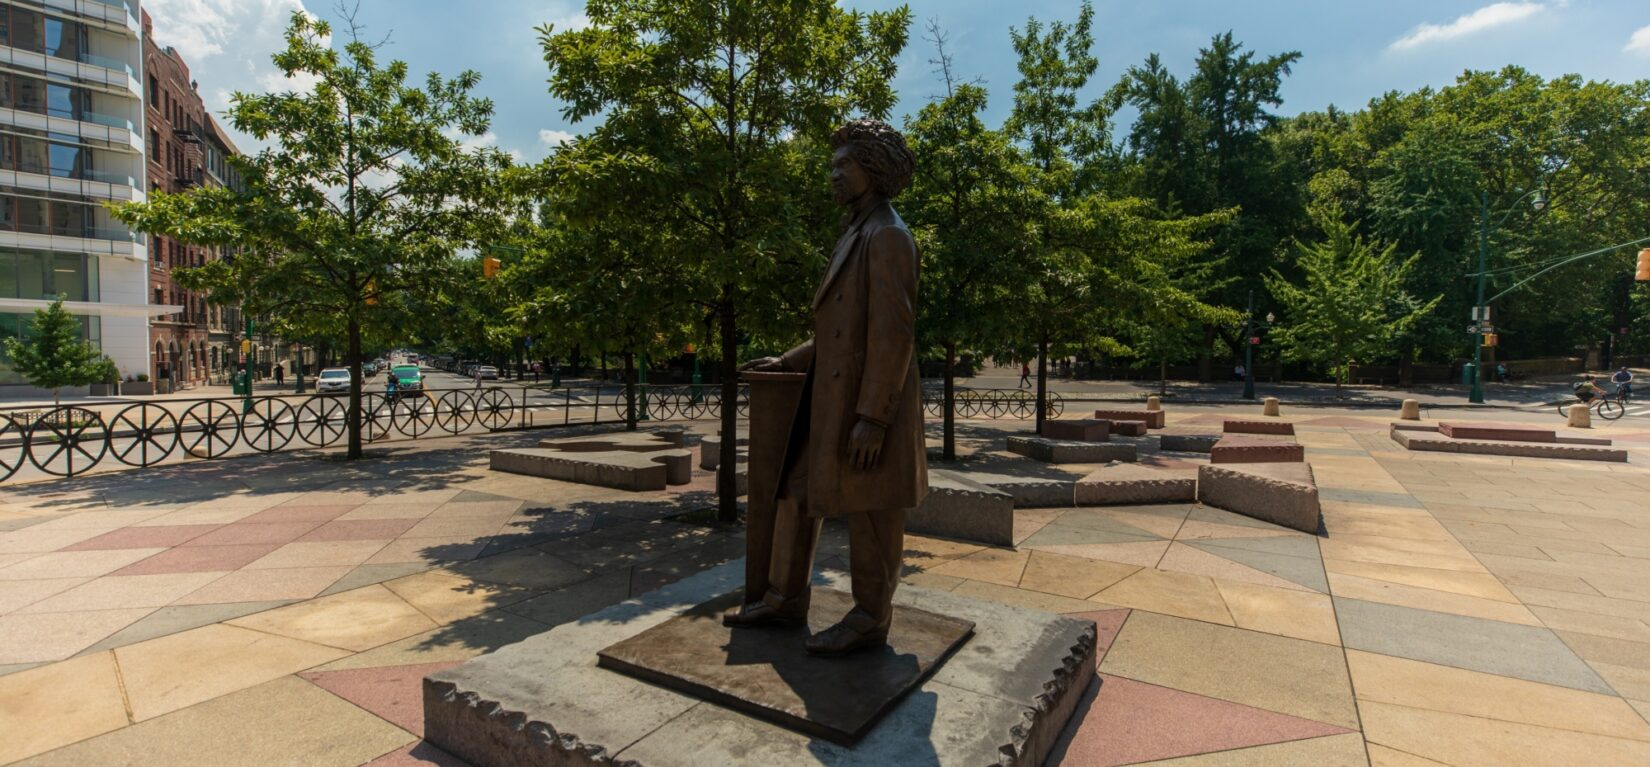 The memorial at Frederick Douglass Circle